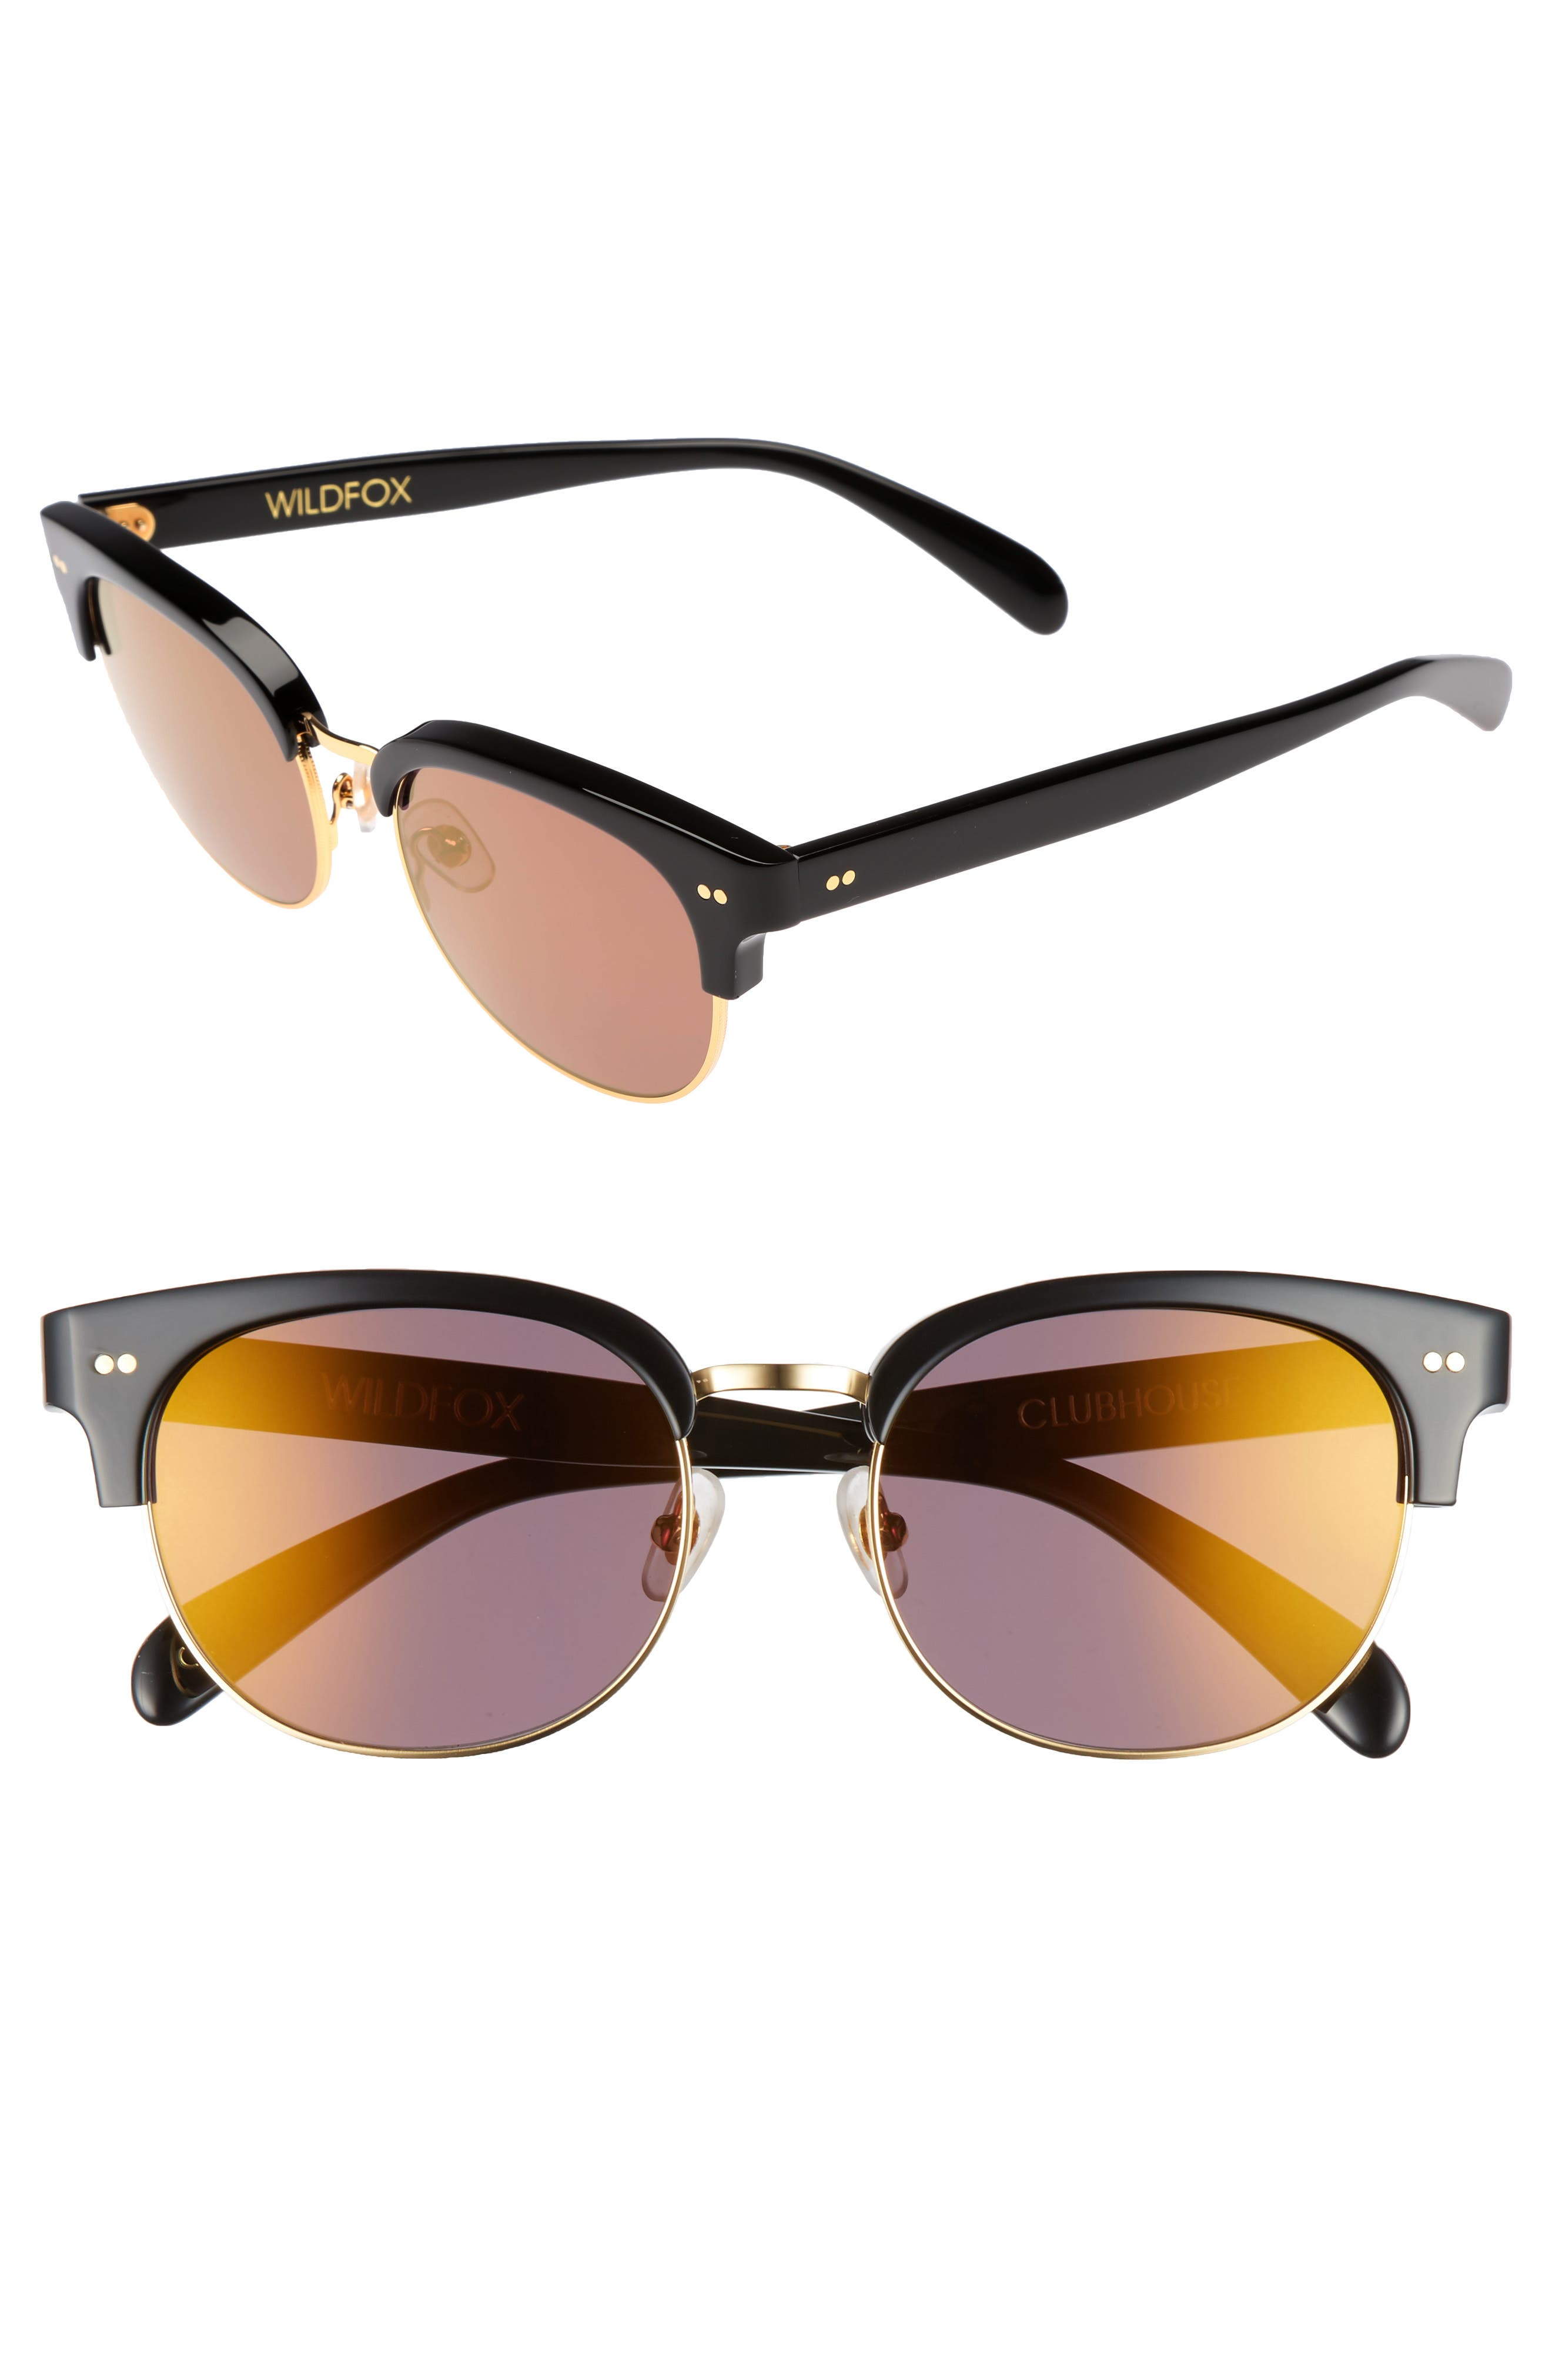 Clubhouse 50mm Semi-Rimless Sunglasses,                         Main,                         color, Black/ Gold